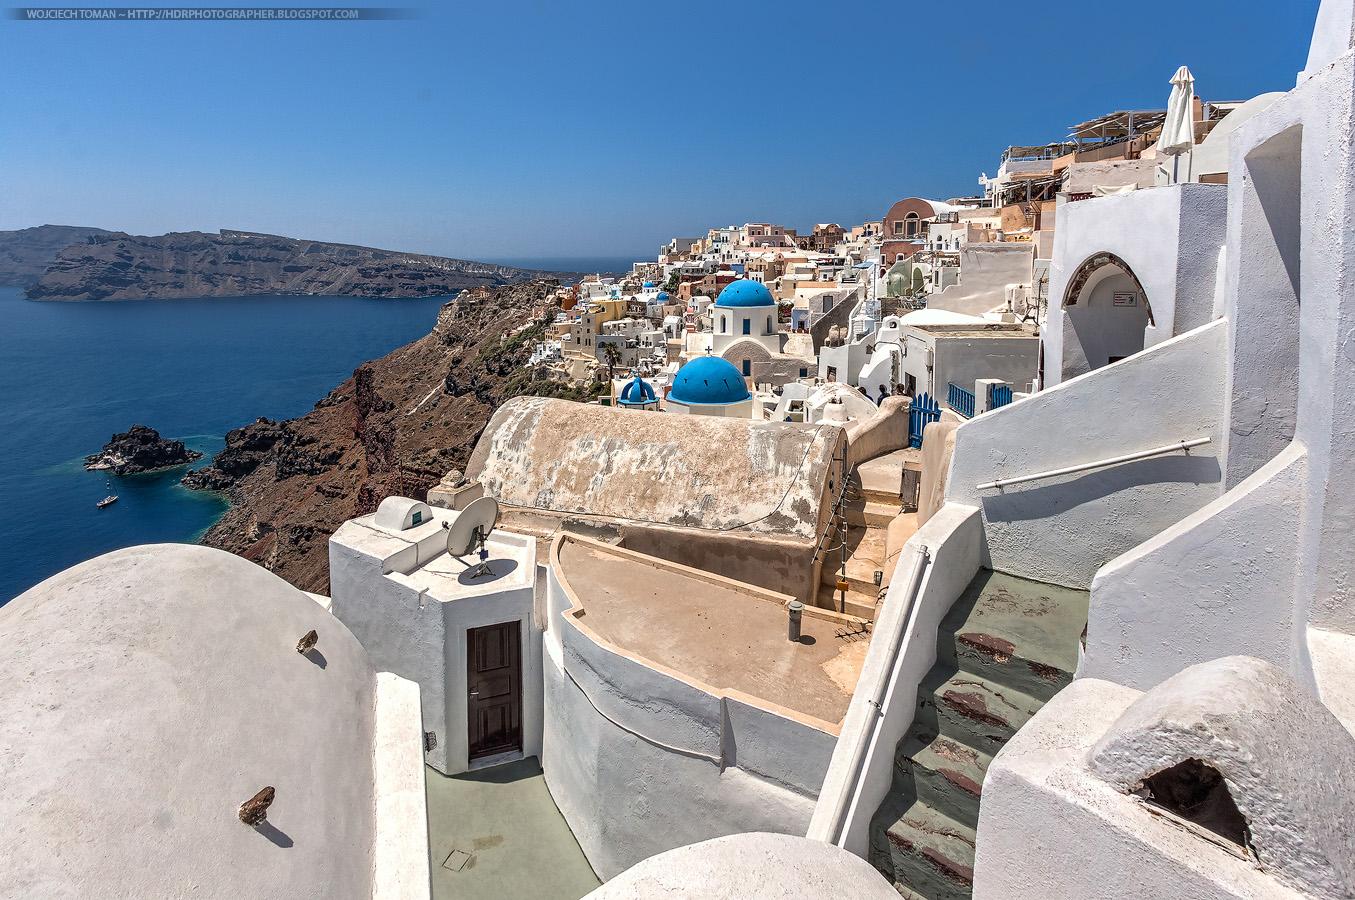 Oia on Santorini